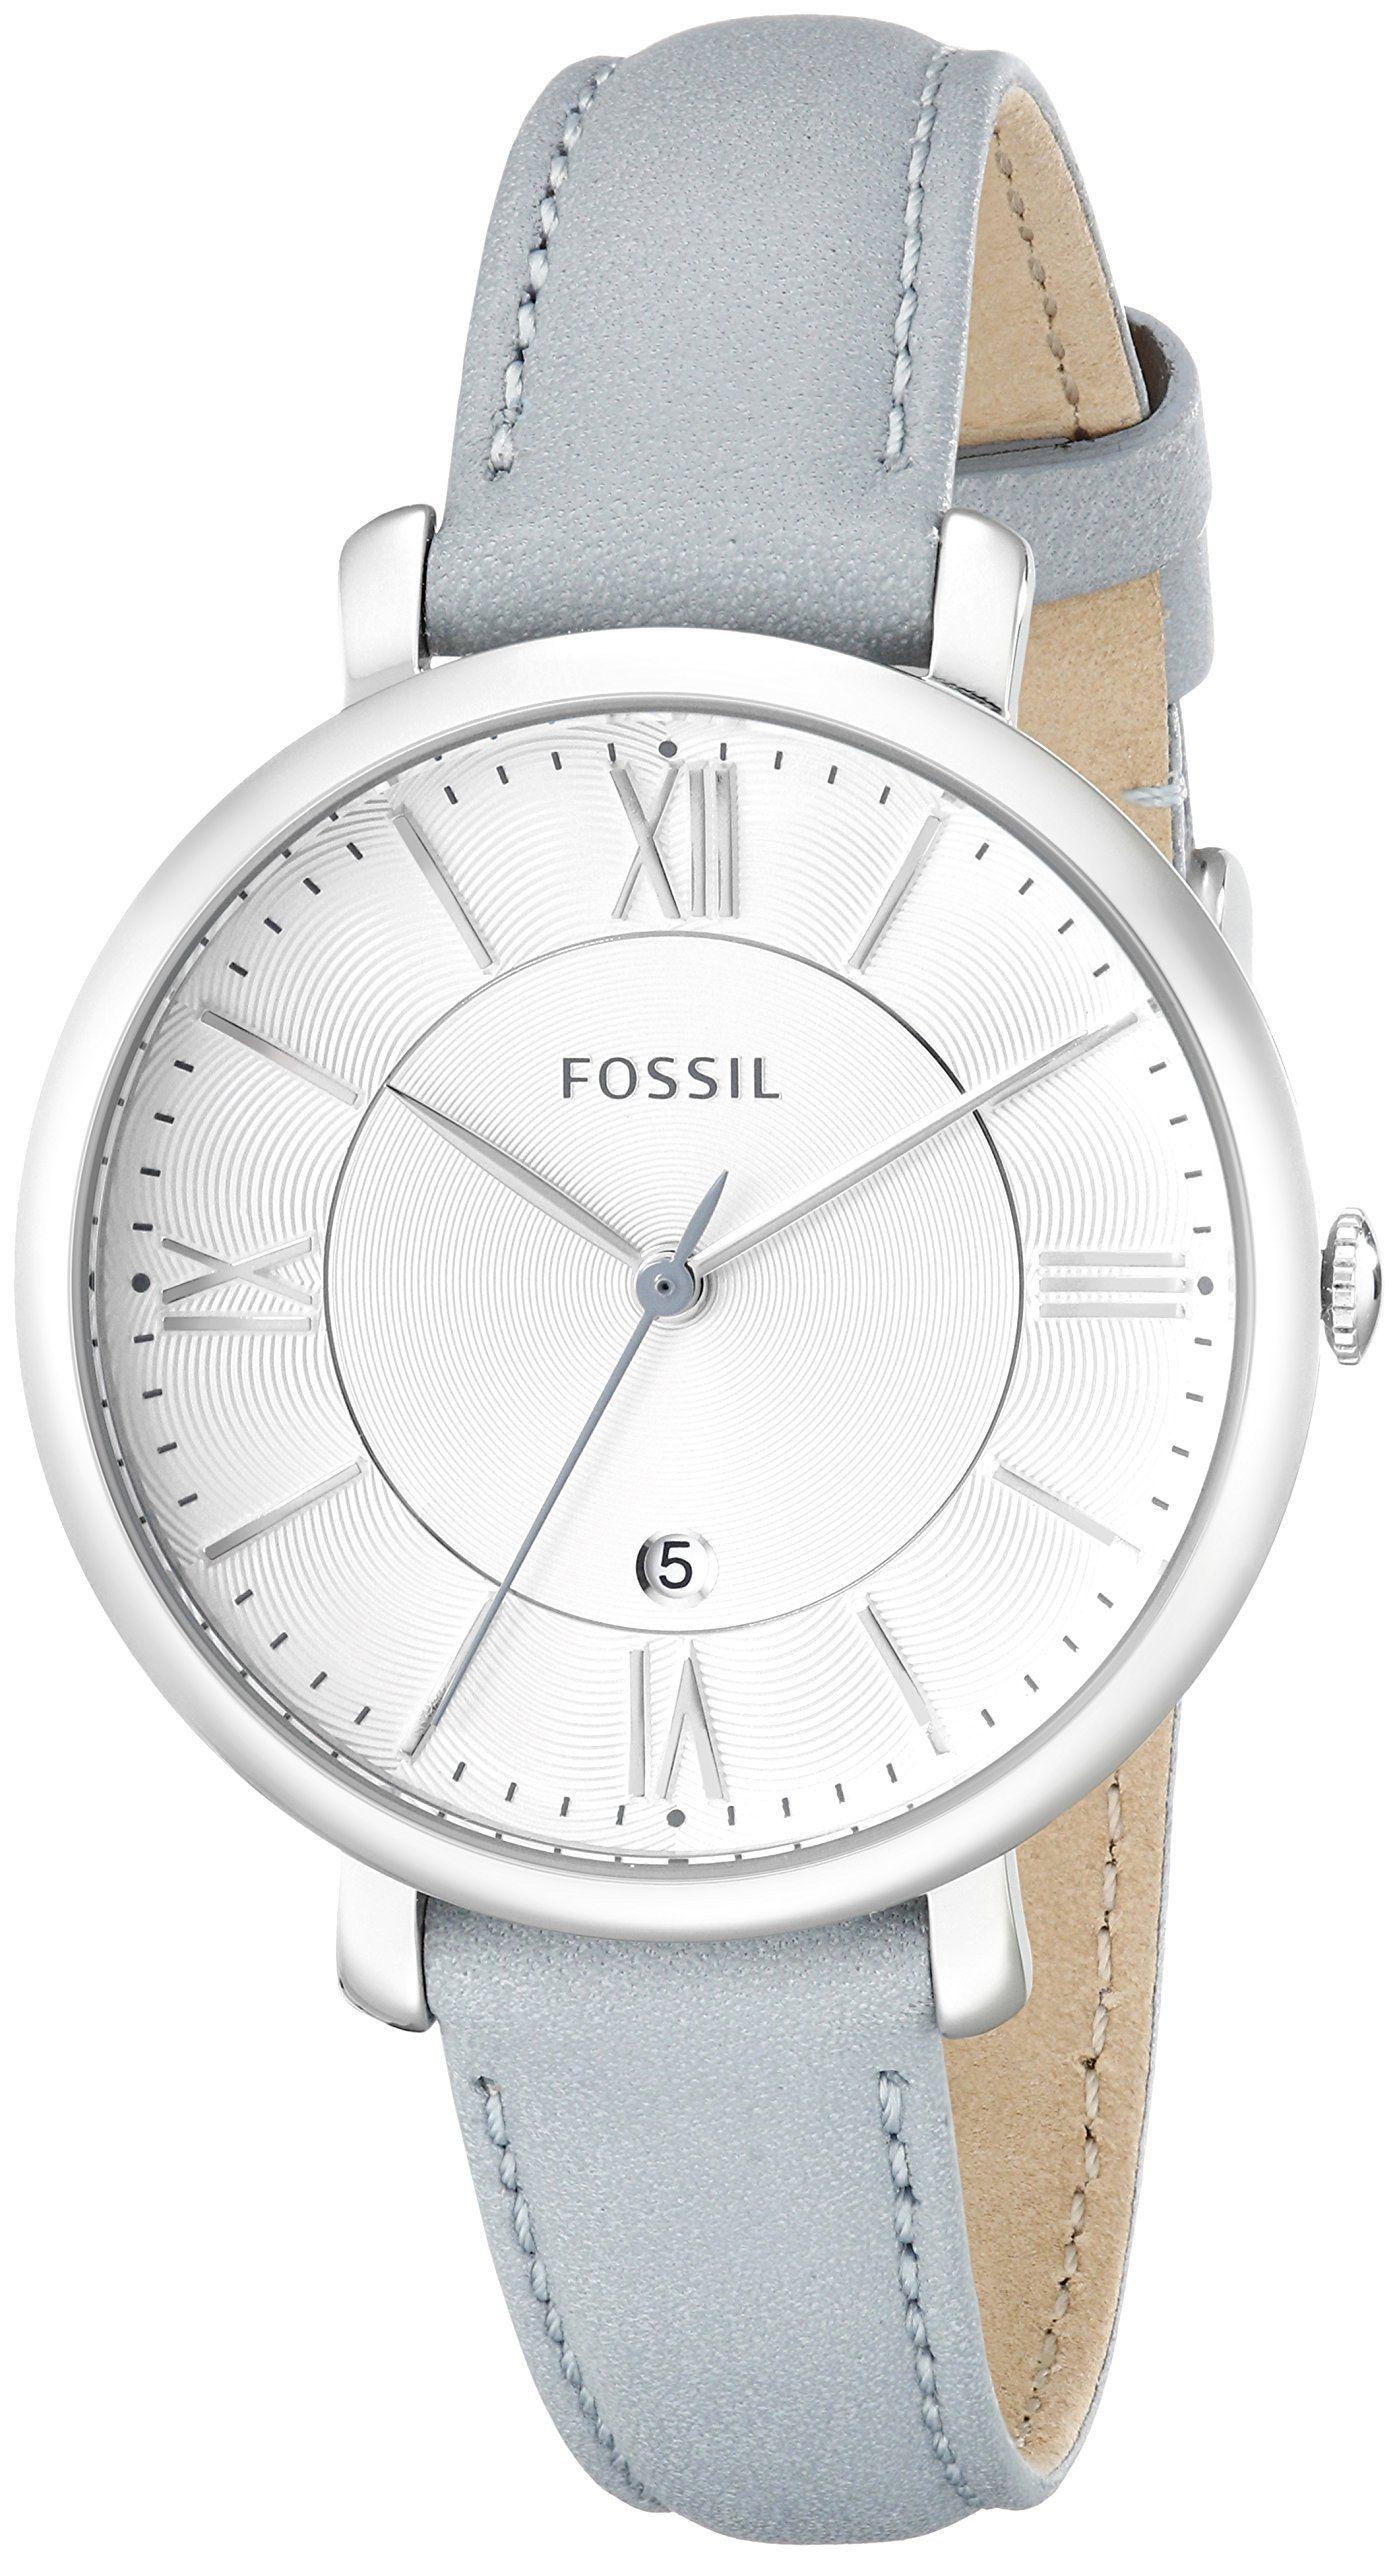 9dae6b6c88e Amazon.com  Fossil Women s ES3821 Jacqueline Analog Display Analog Quartz  Blue Watch  Watches